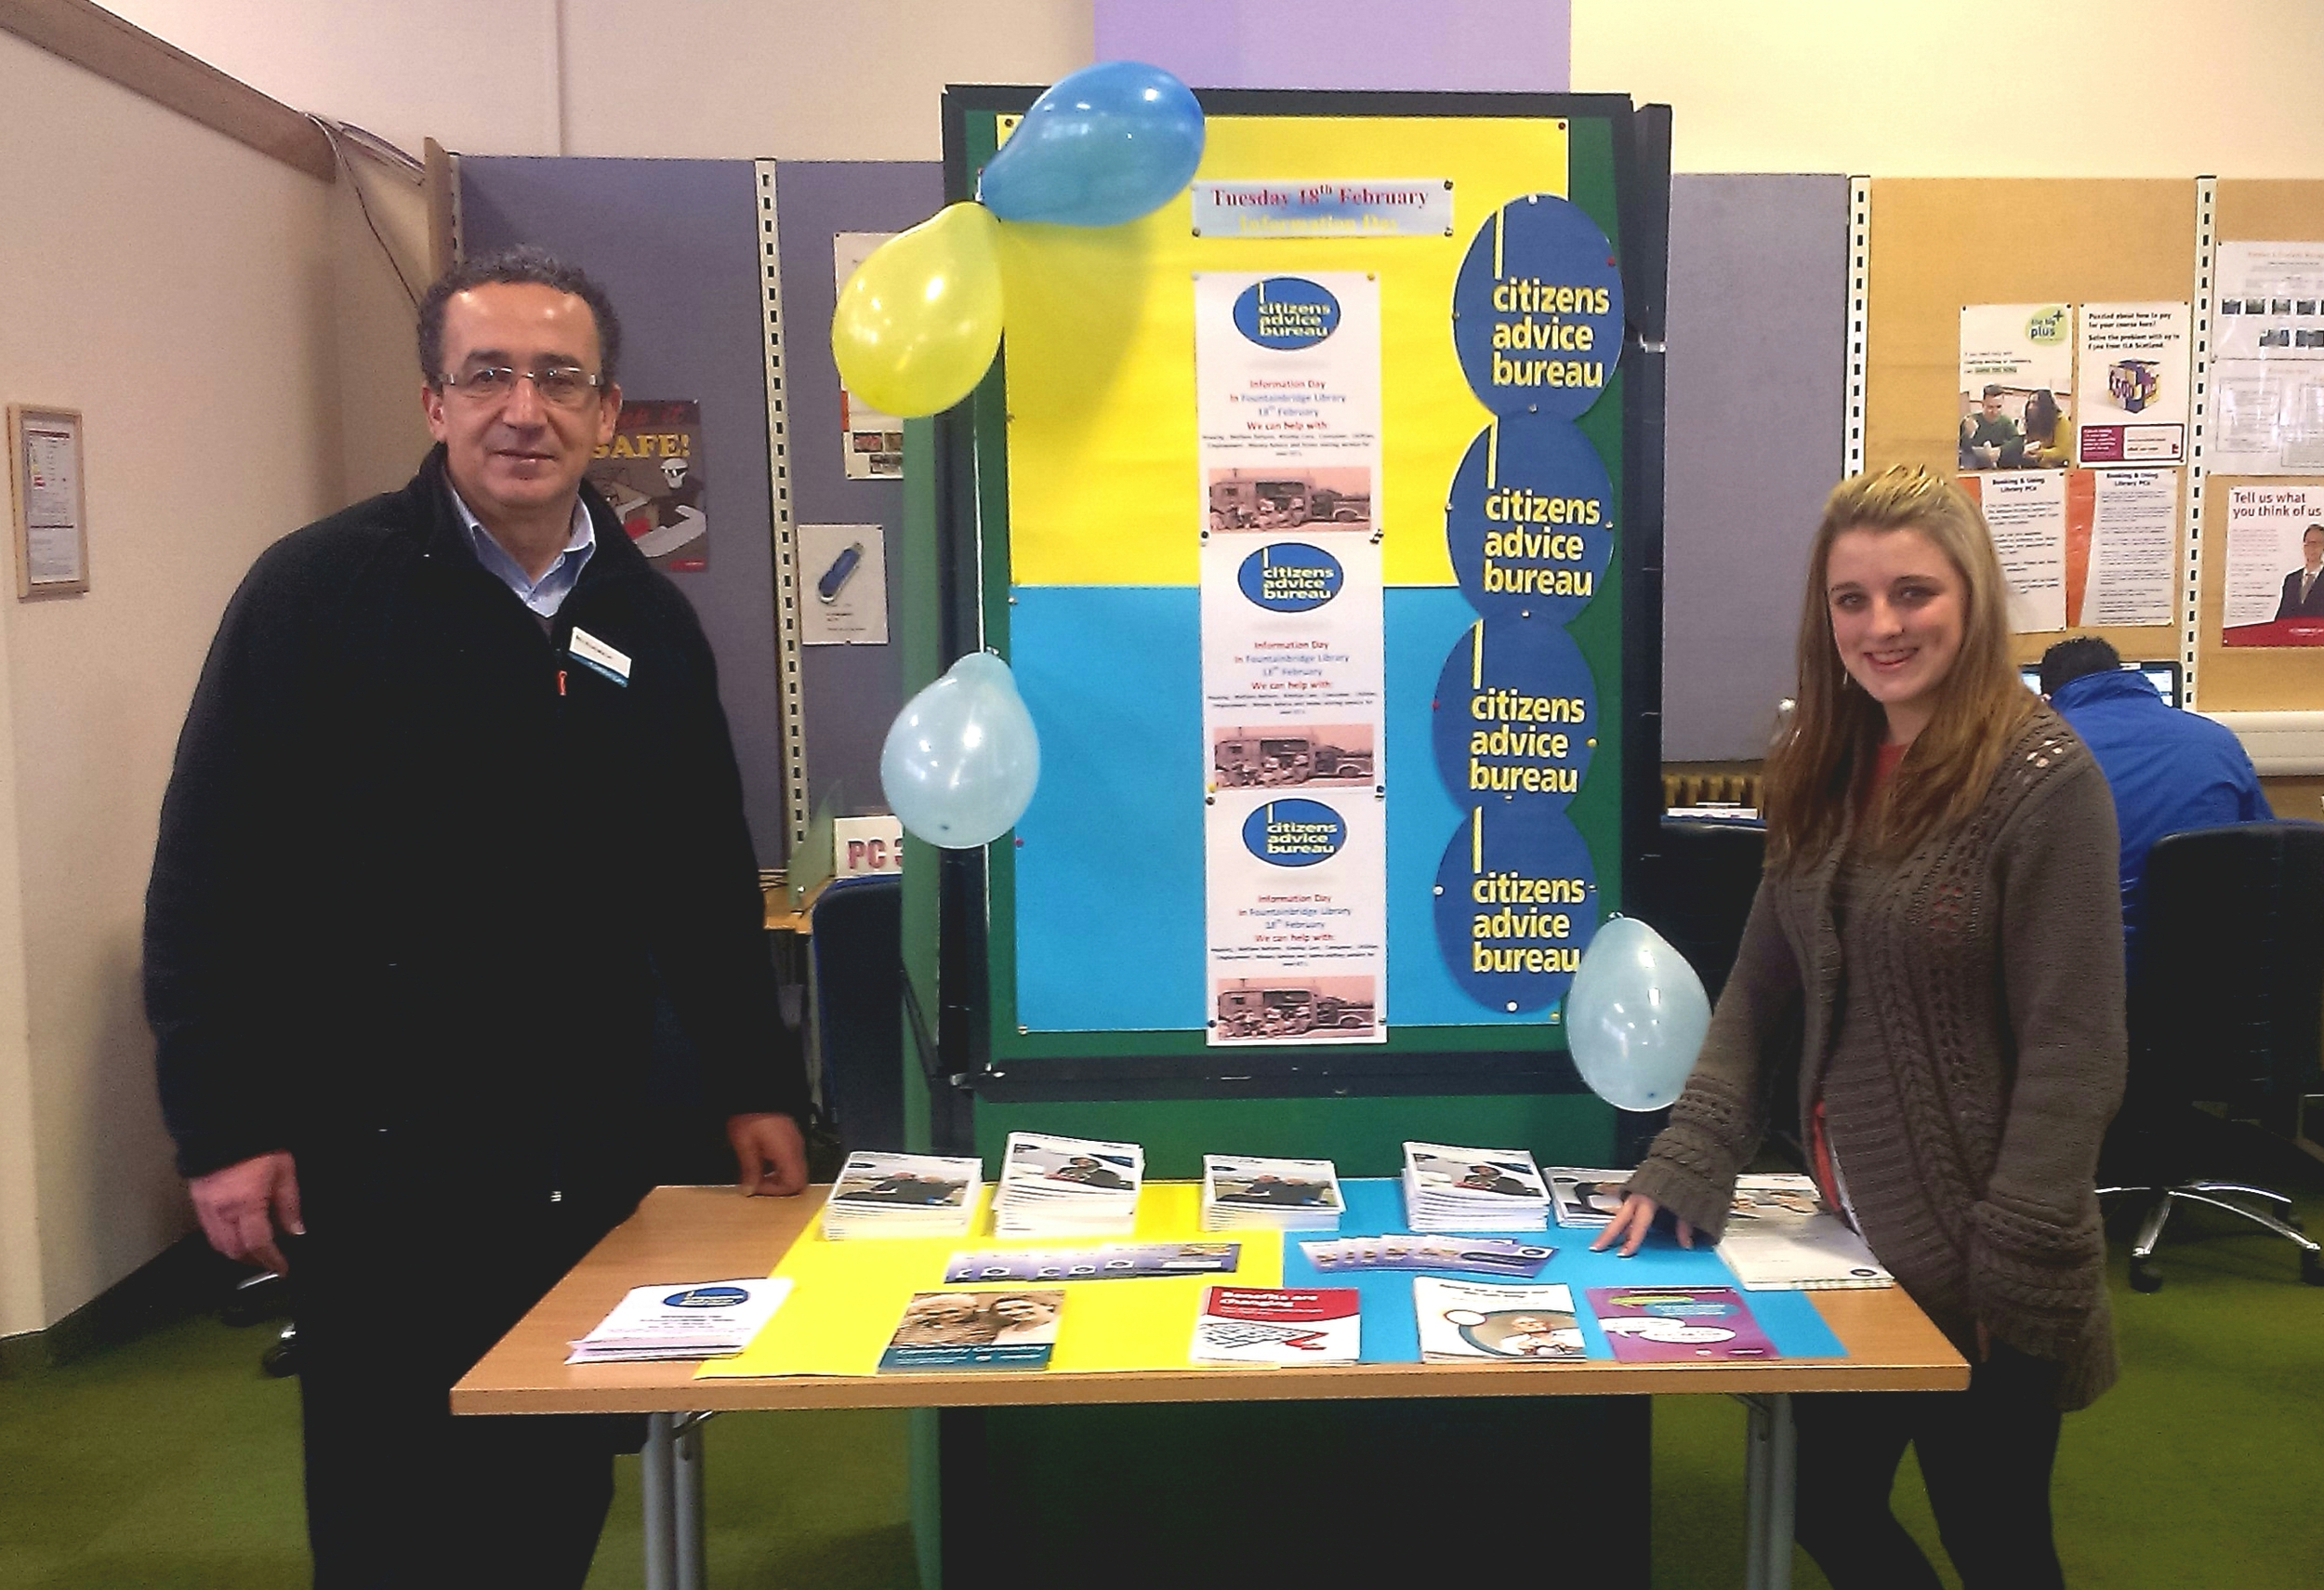 Joint information day with Fountainbridge Library & Gorgie/Dalry Bureau